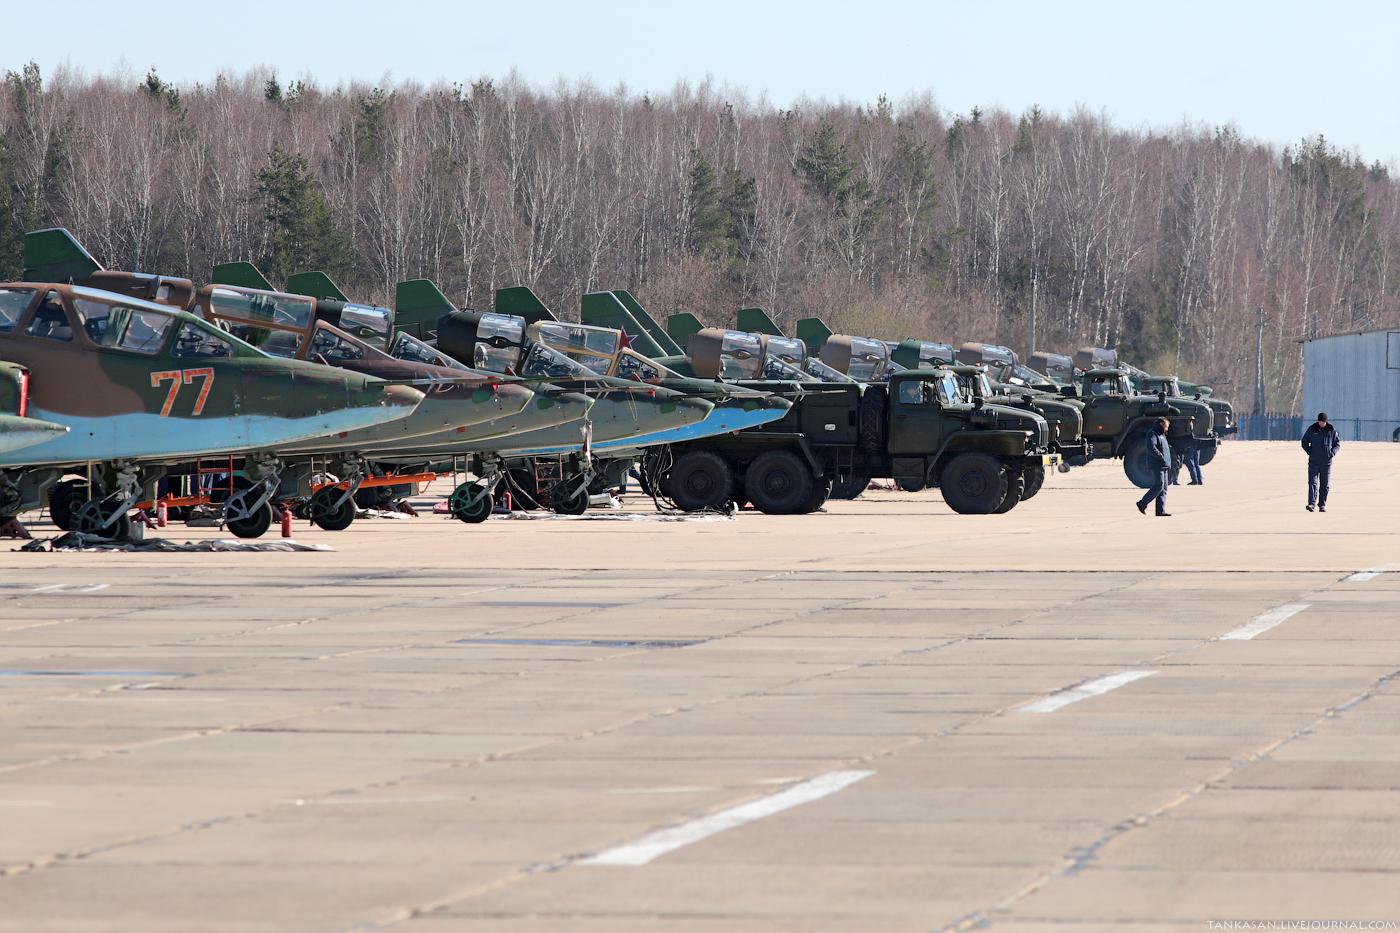 Sukhoi Su-25 Frogfoot - Page 3 0_b98ab_a2d324c5_orig